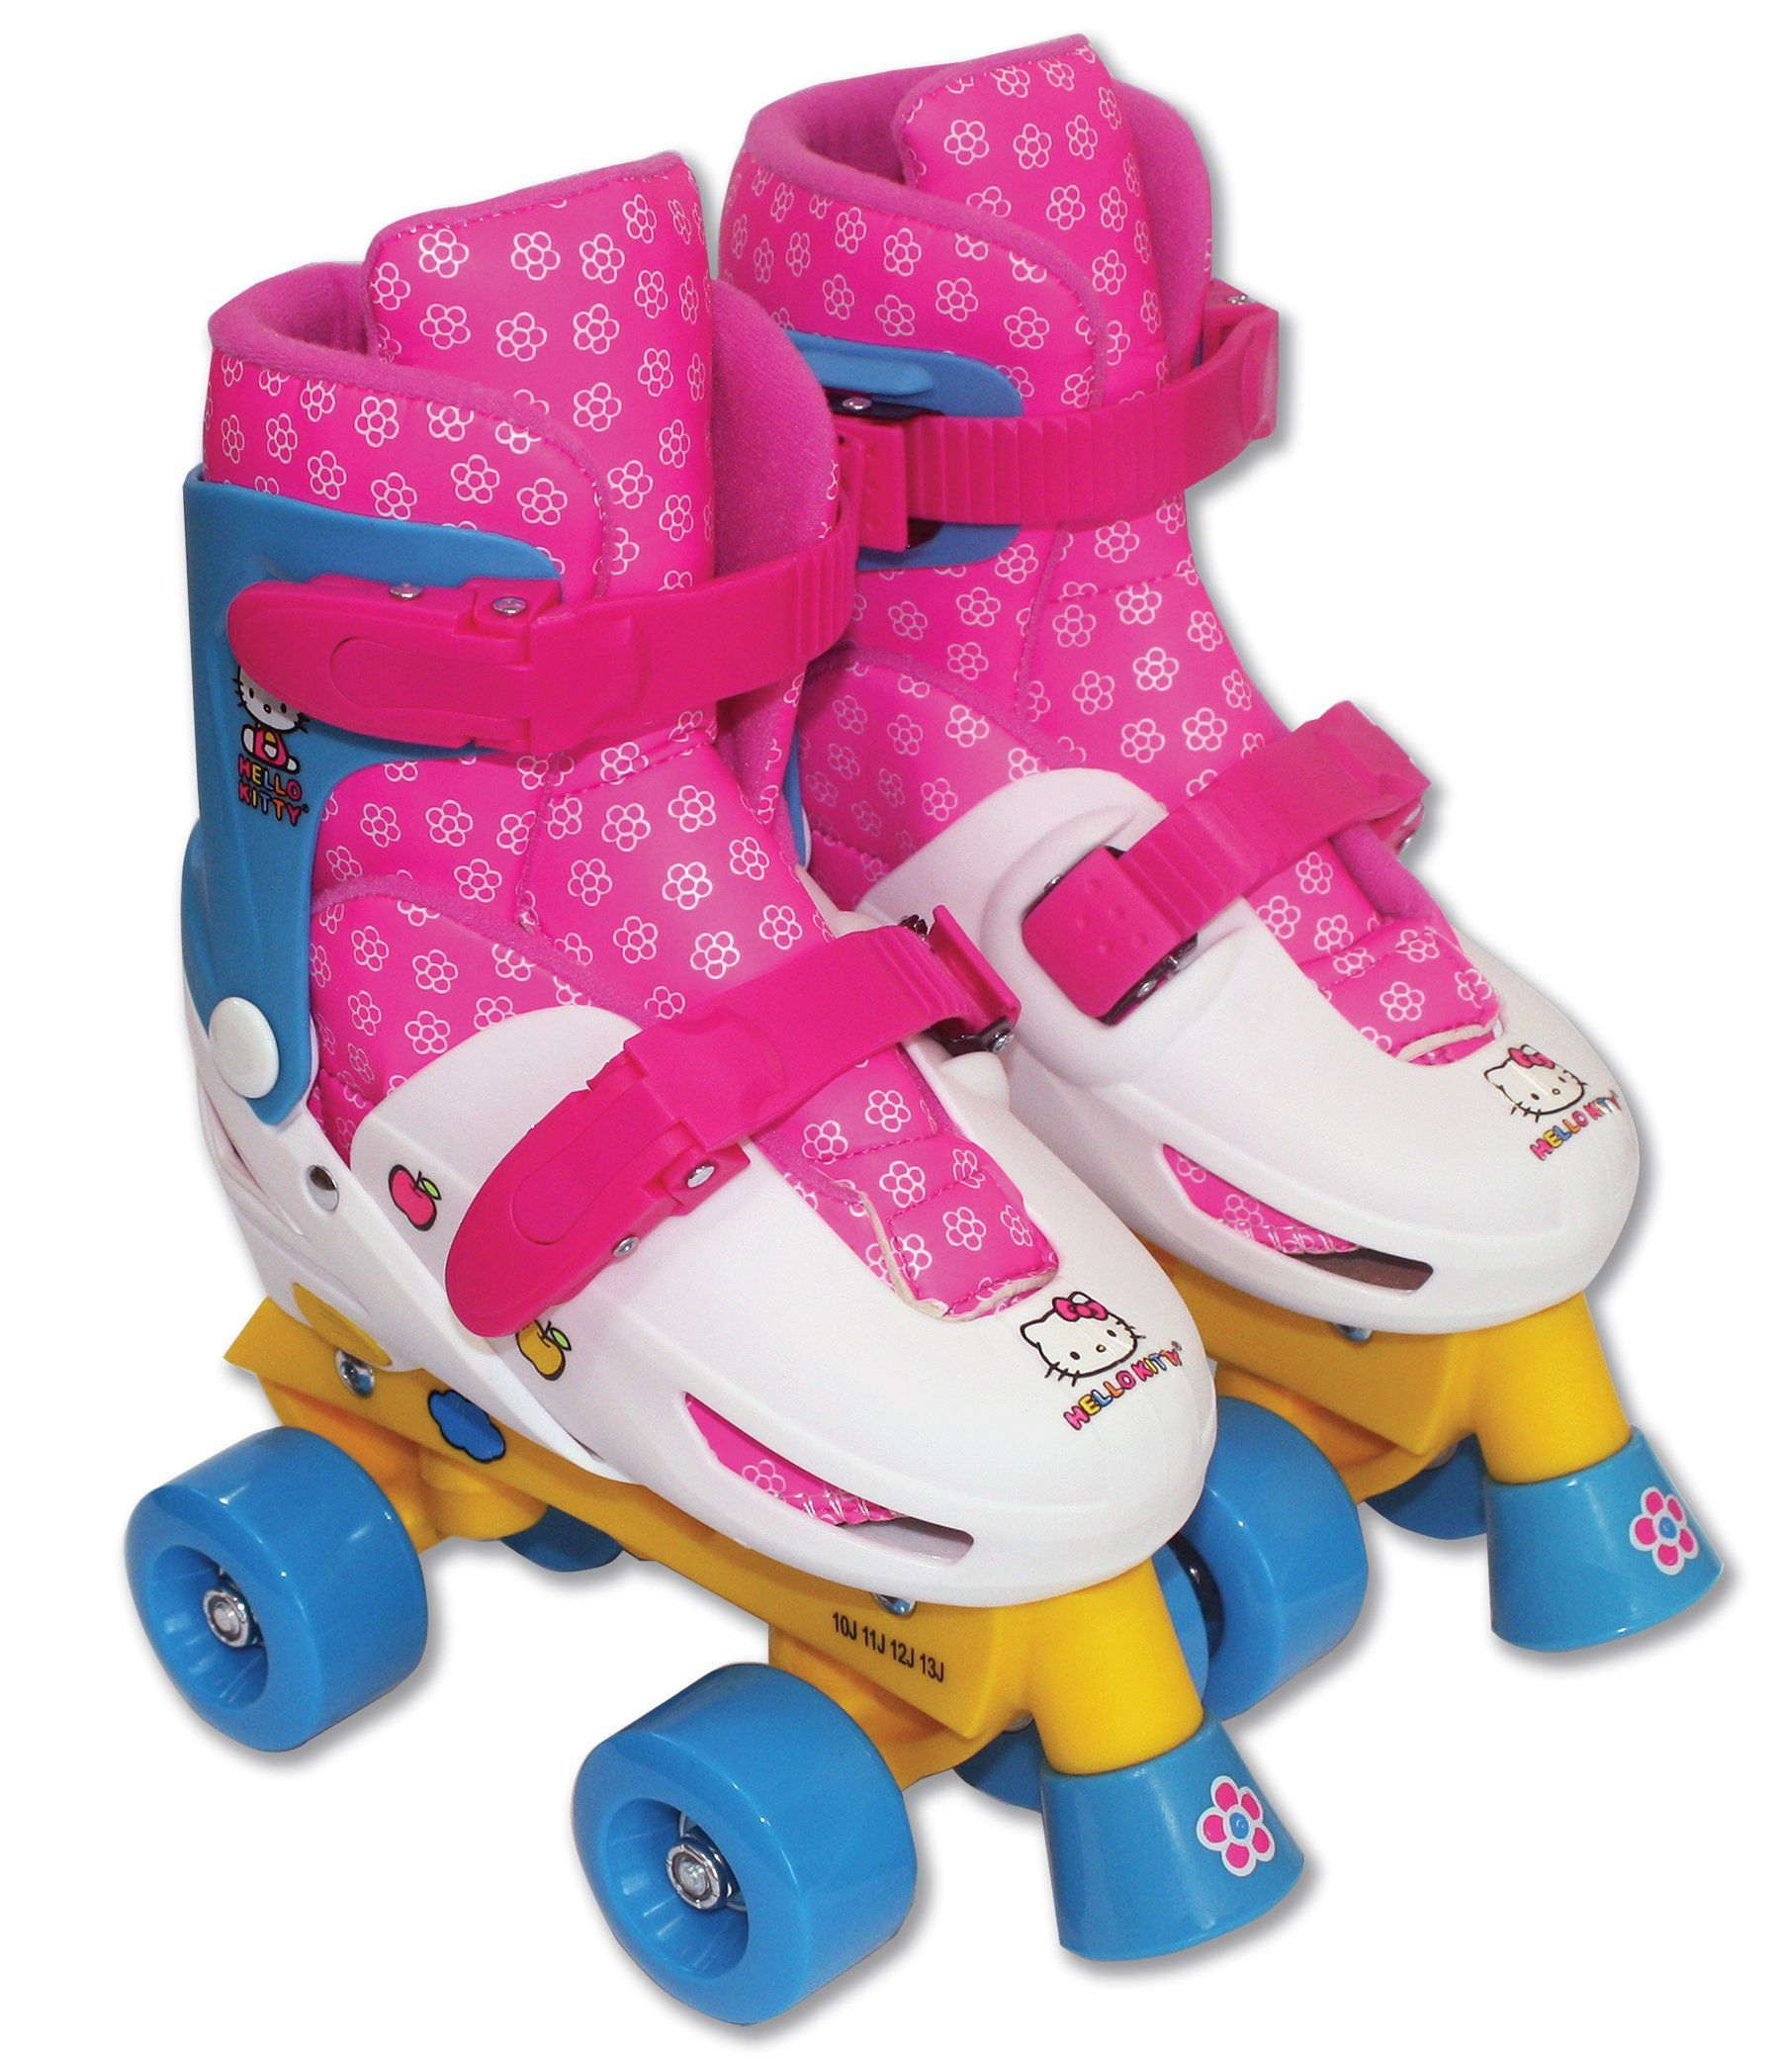 Roller skate shoes size 10 - Hello Kitty Adjustable Quad Roller Skate Size 10 13